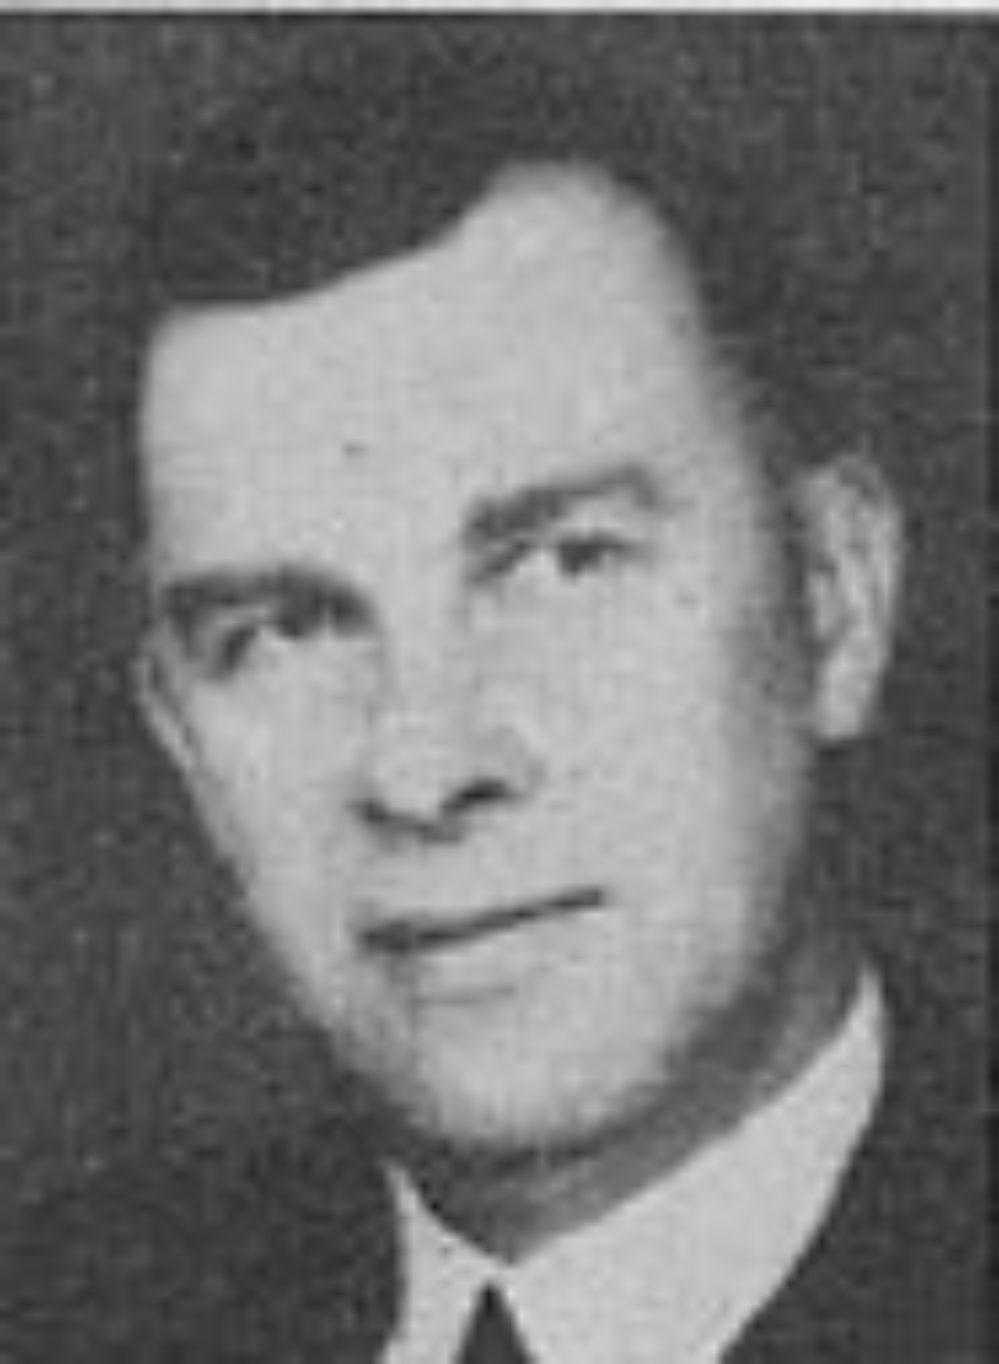 Halfdan Sigurd Osnes